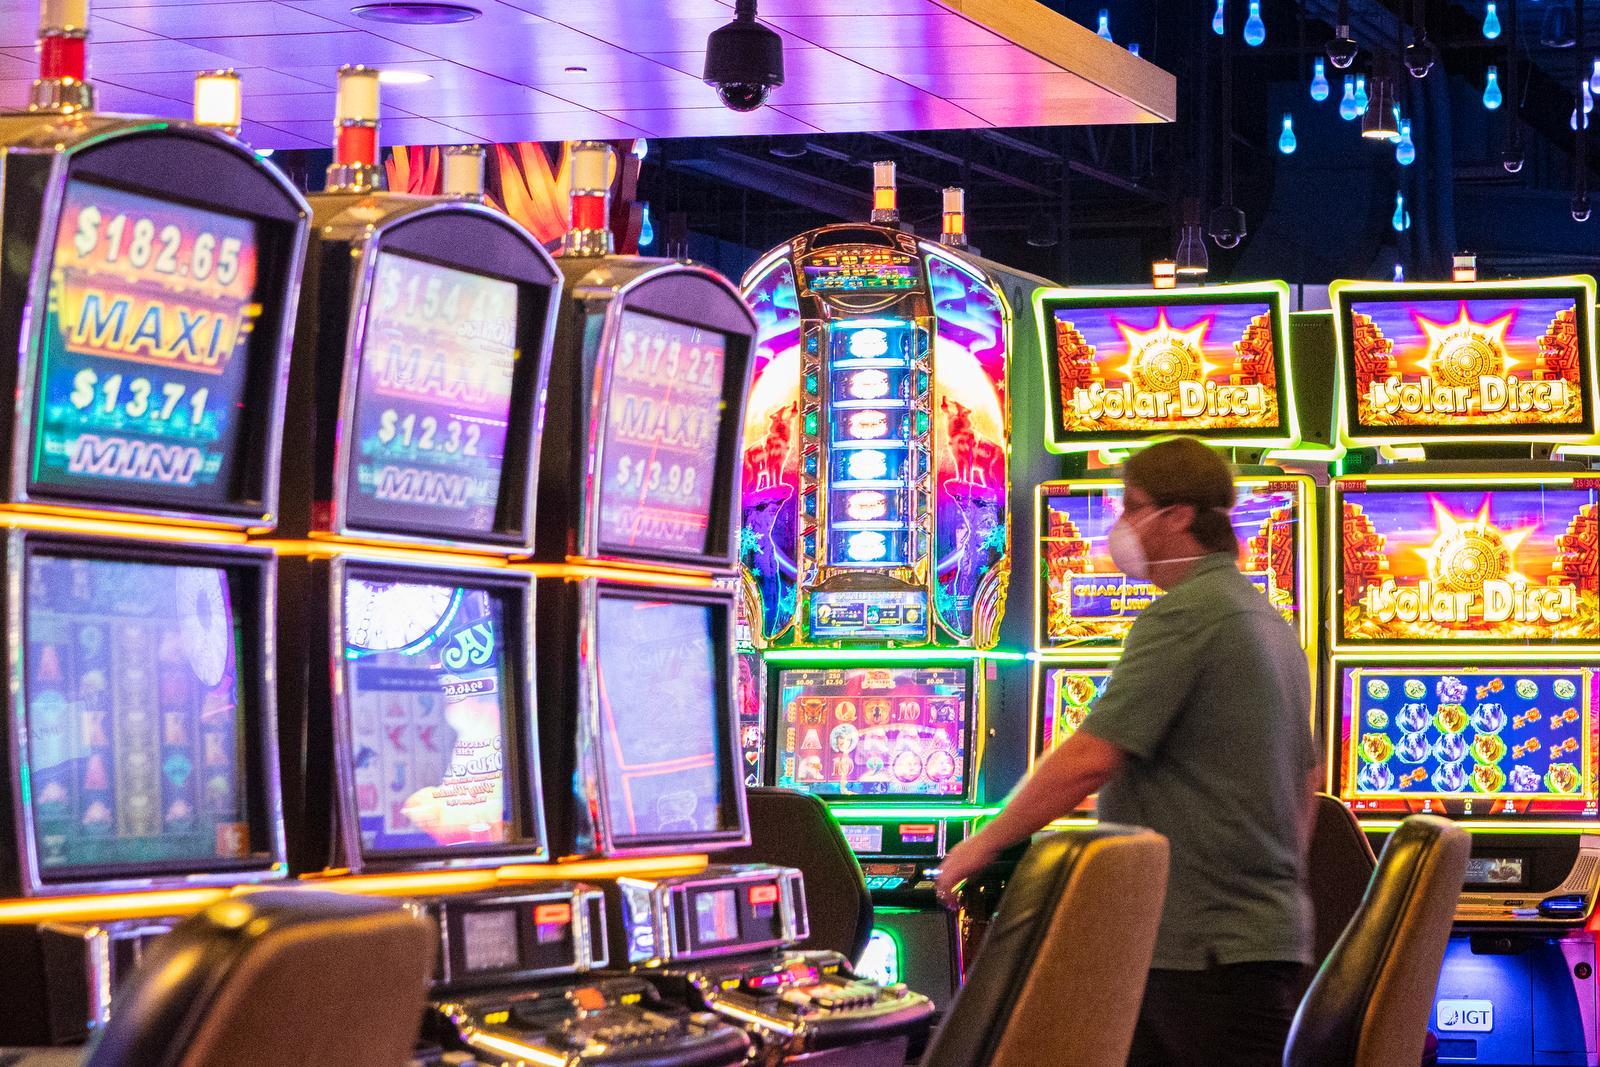 6 Tribal Casinos Close Most Remain Open Amid New Michigan Covid 19 Restrictions Mlive Com